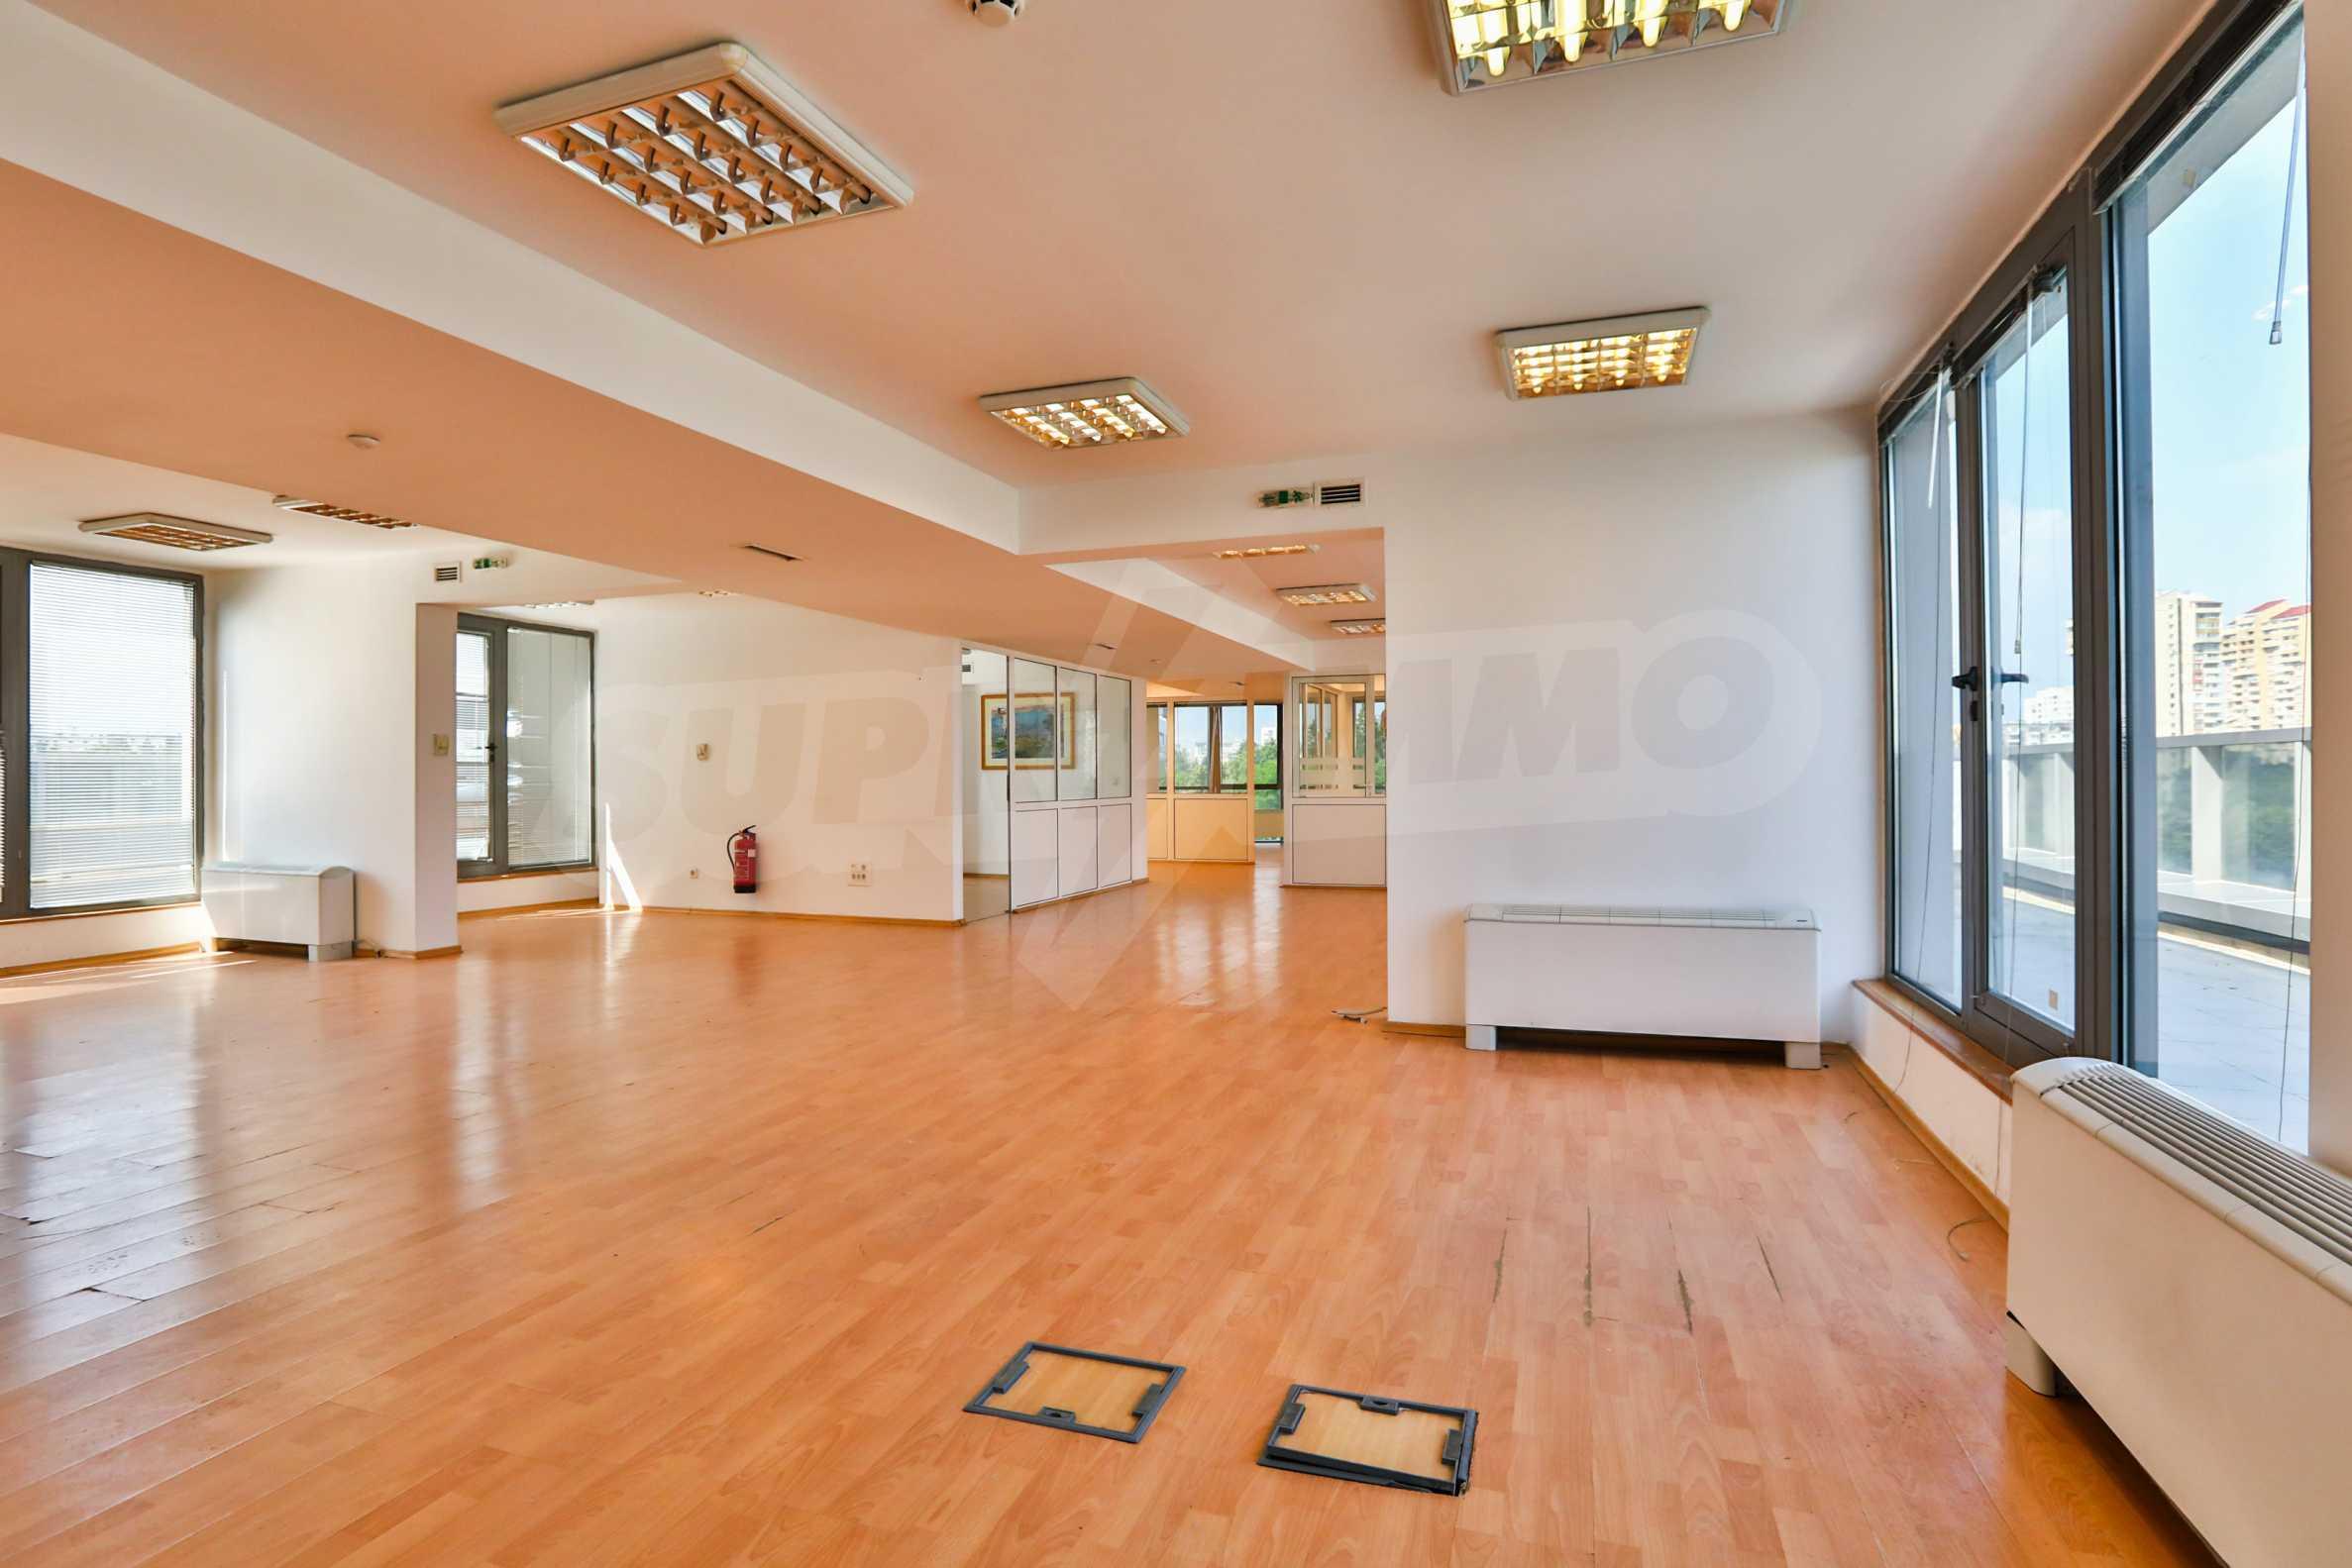 Офис в бизнес сграда висок клас на бул. Цариградско шосе 8